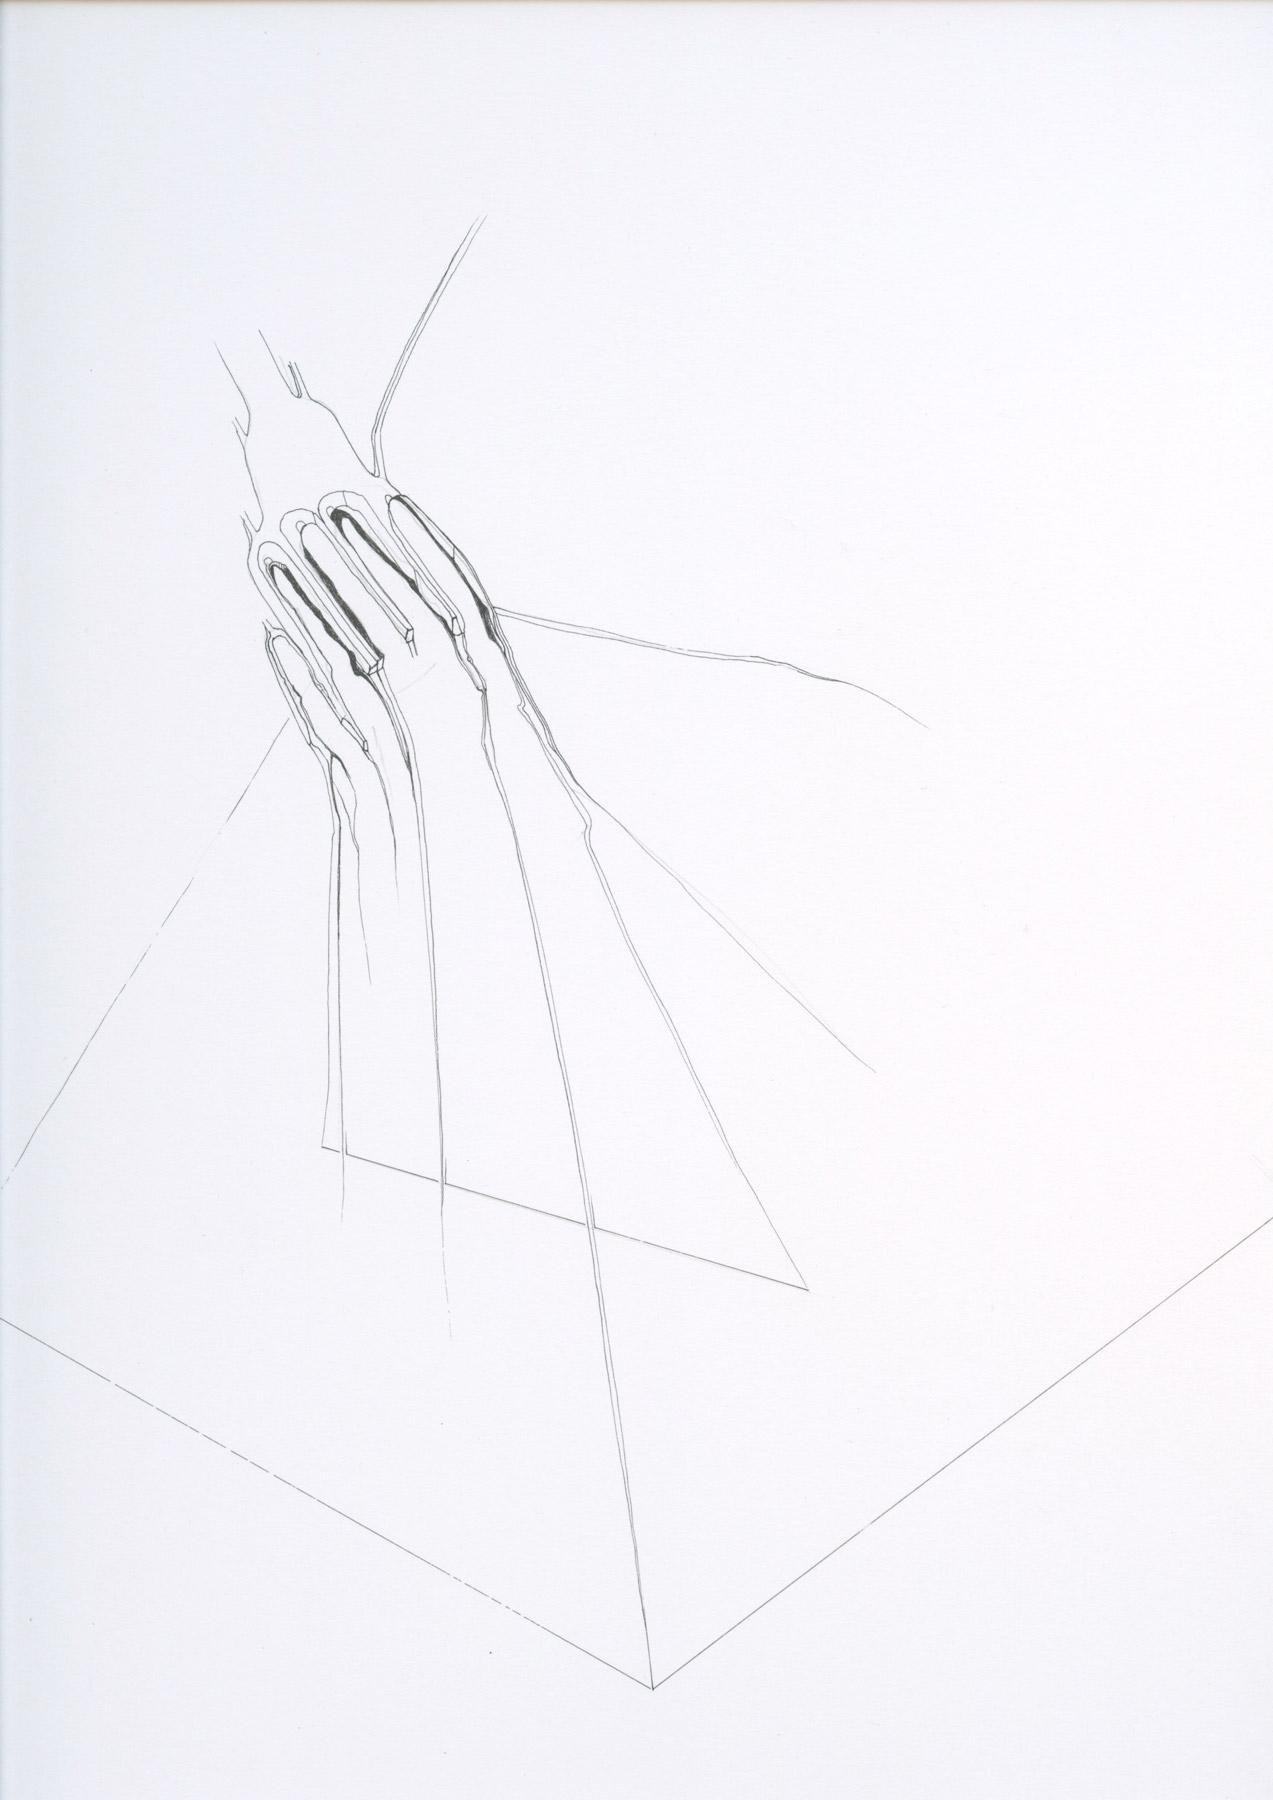 Nina Annabelle Märkl | Untitled | Ink on paper | 40 x 30 cm | Detail